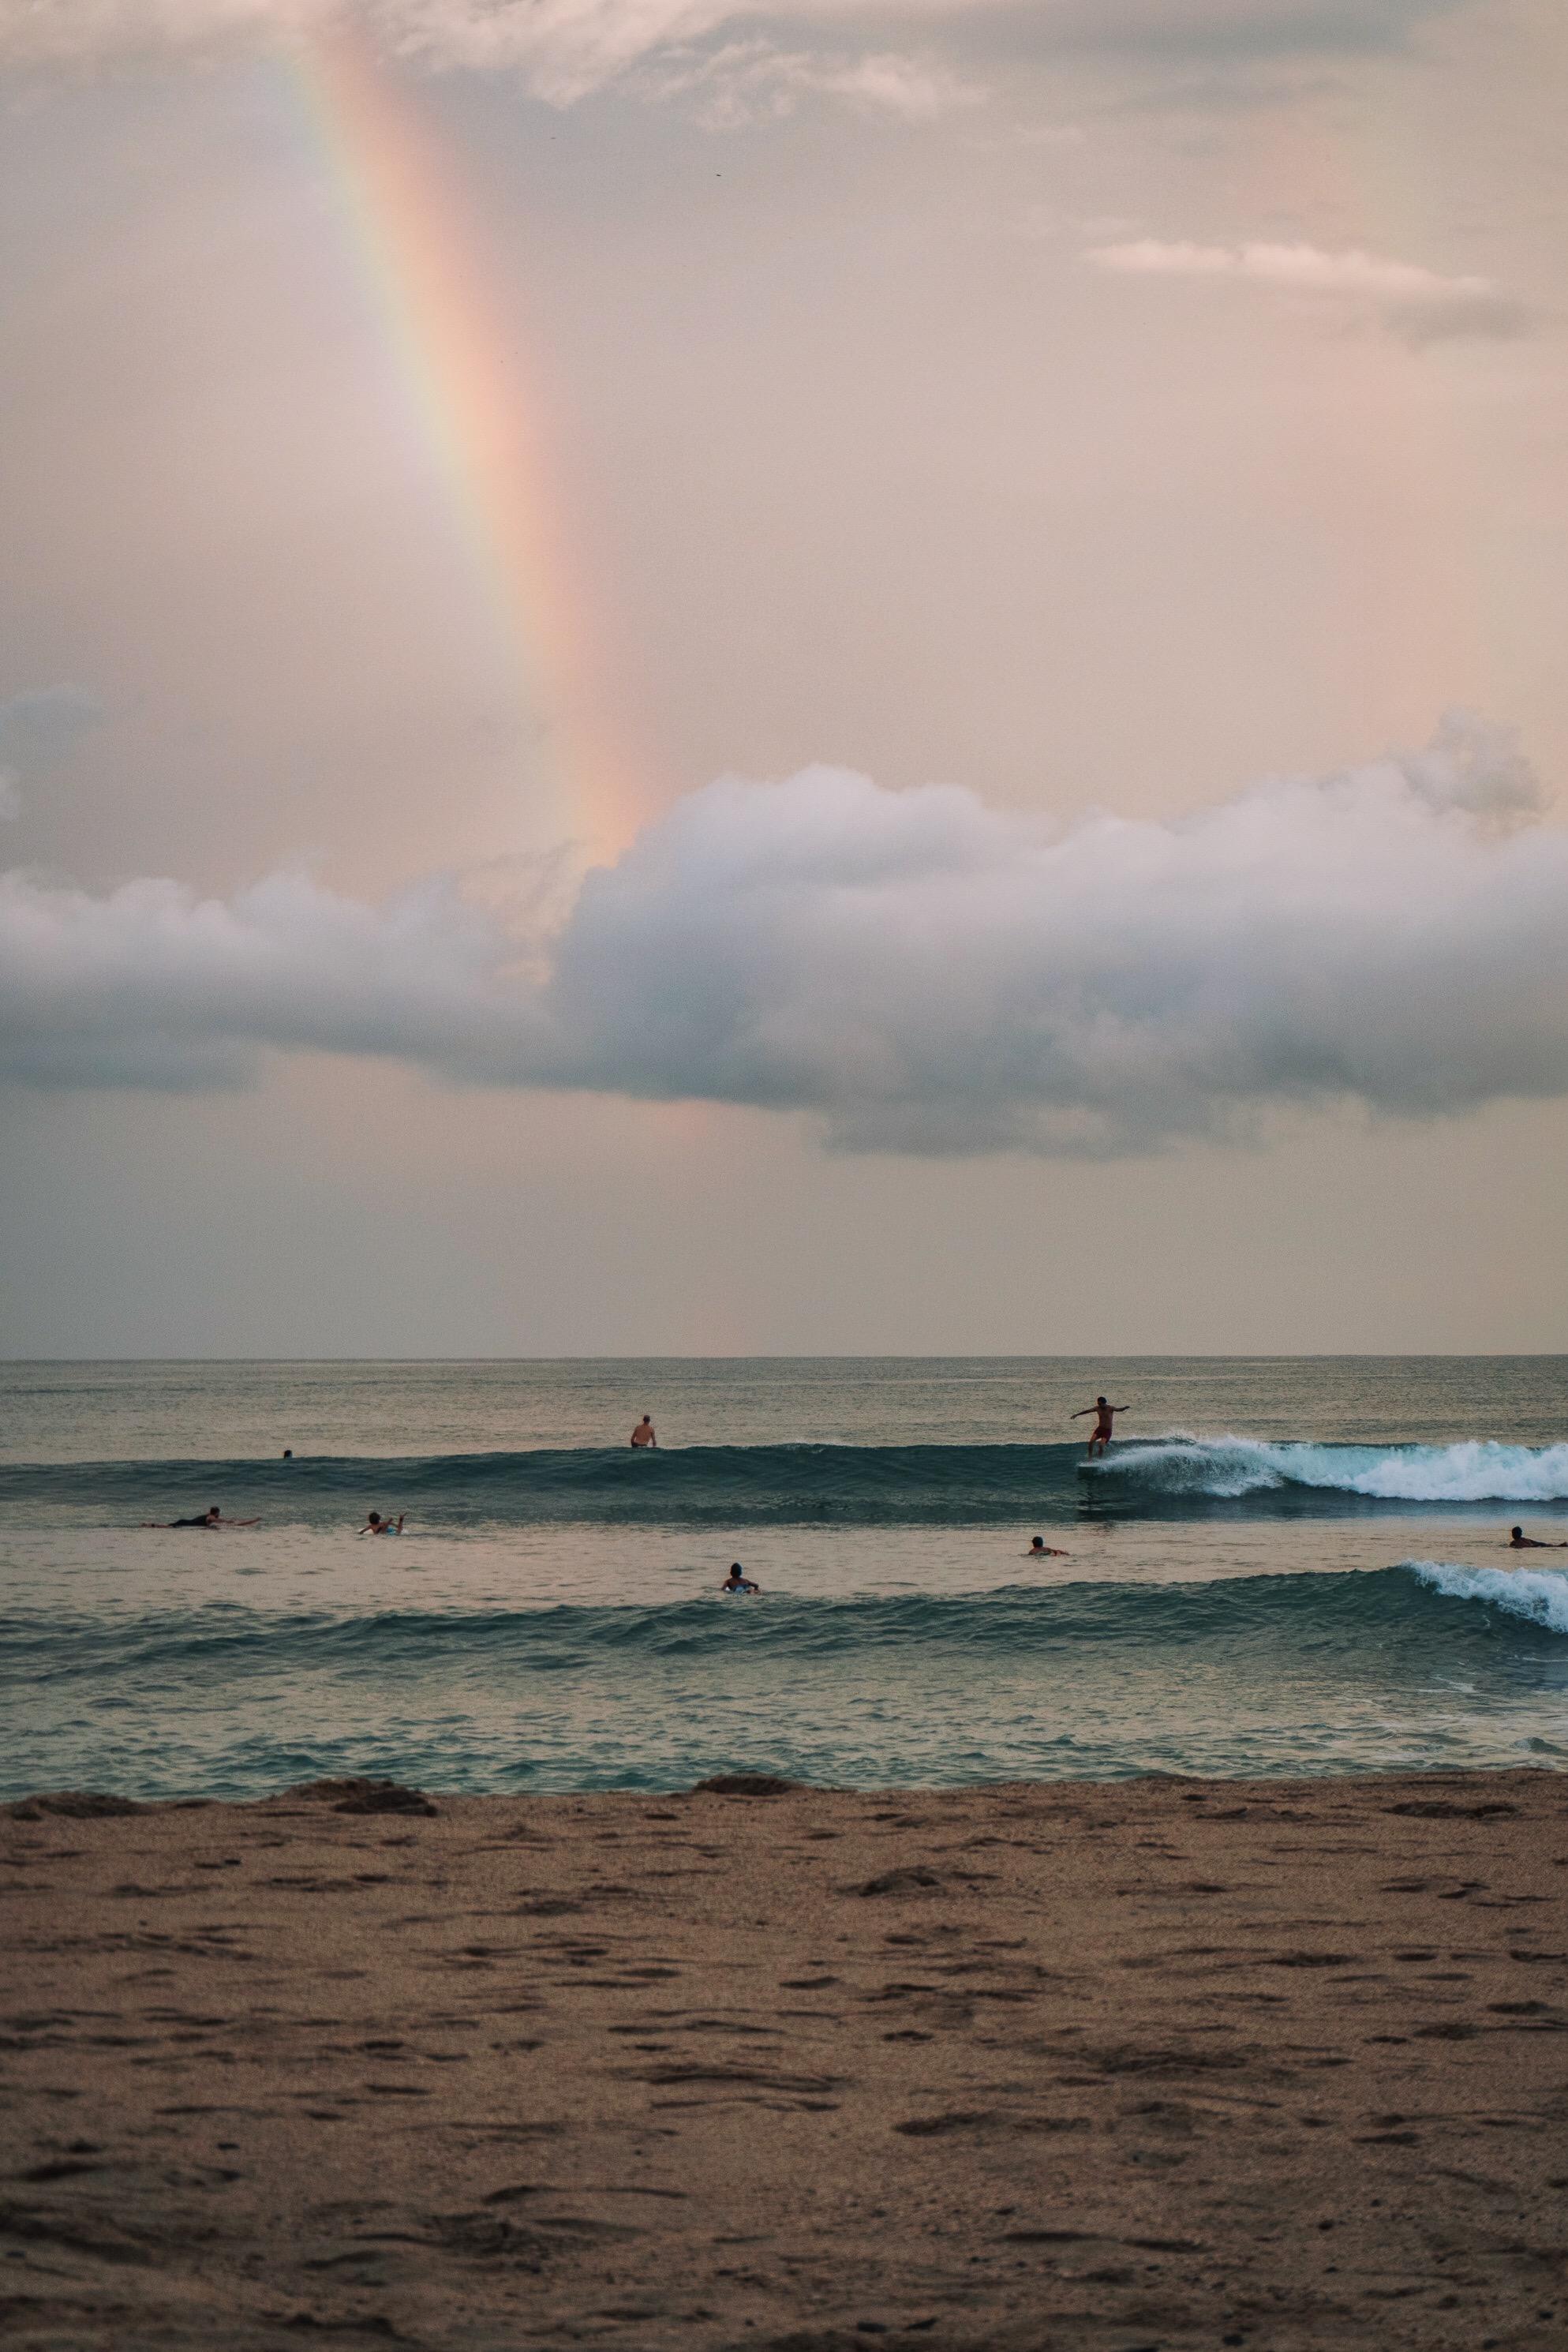 Tristan-Guibald-Surf-México-Sayulita-Pascuales-Zihuatanejo-Fotografía-Heiko-Bothe-9.JPG